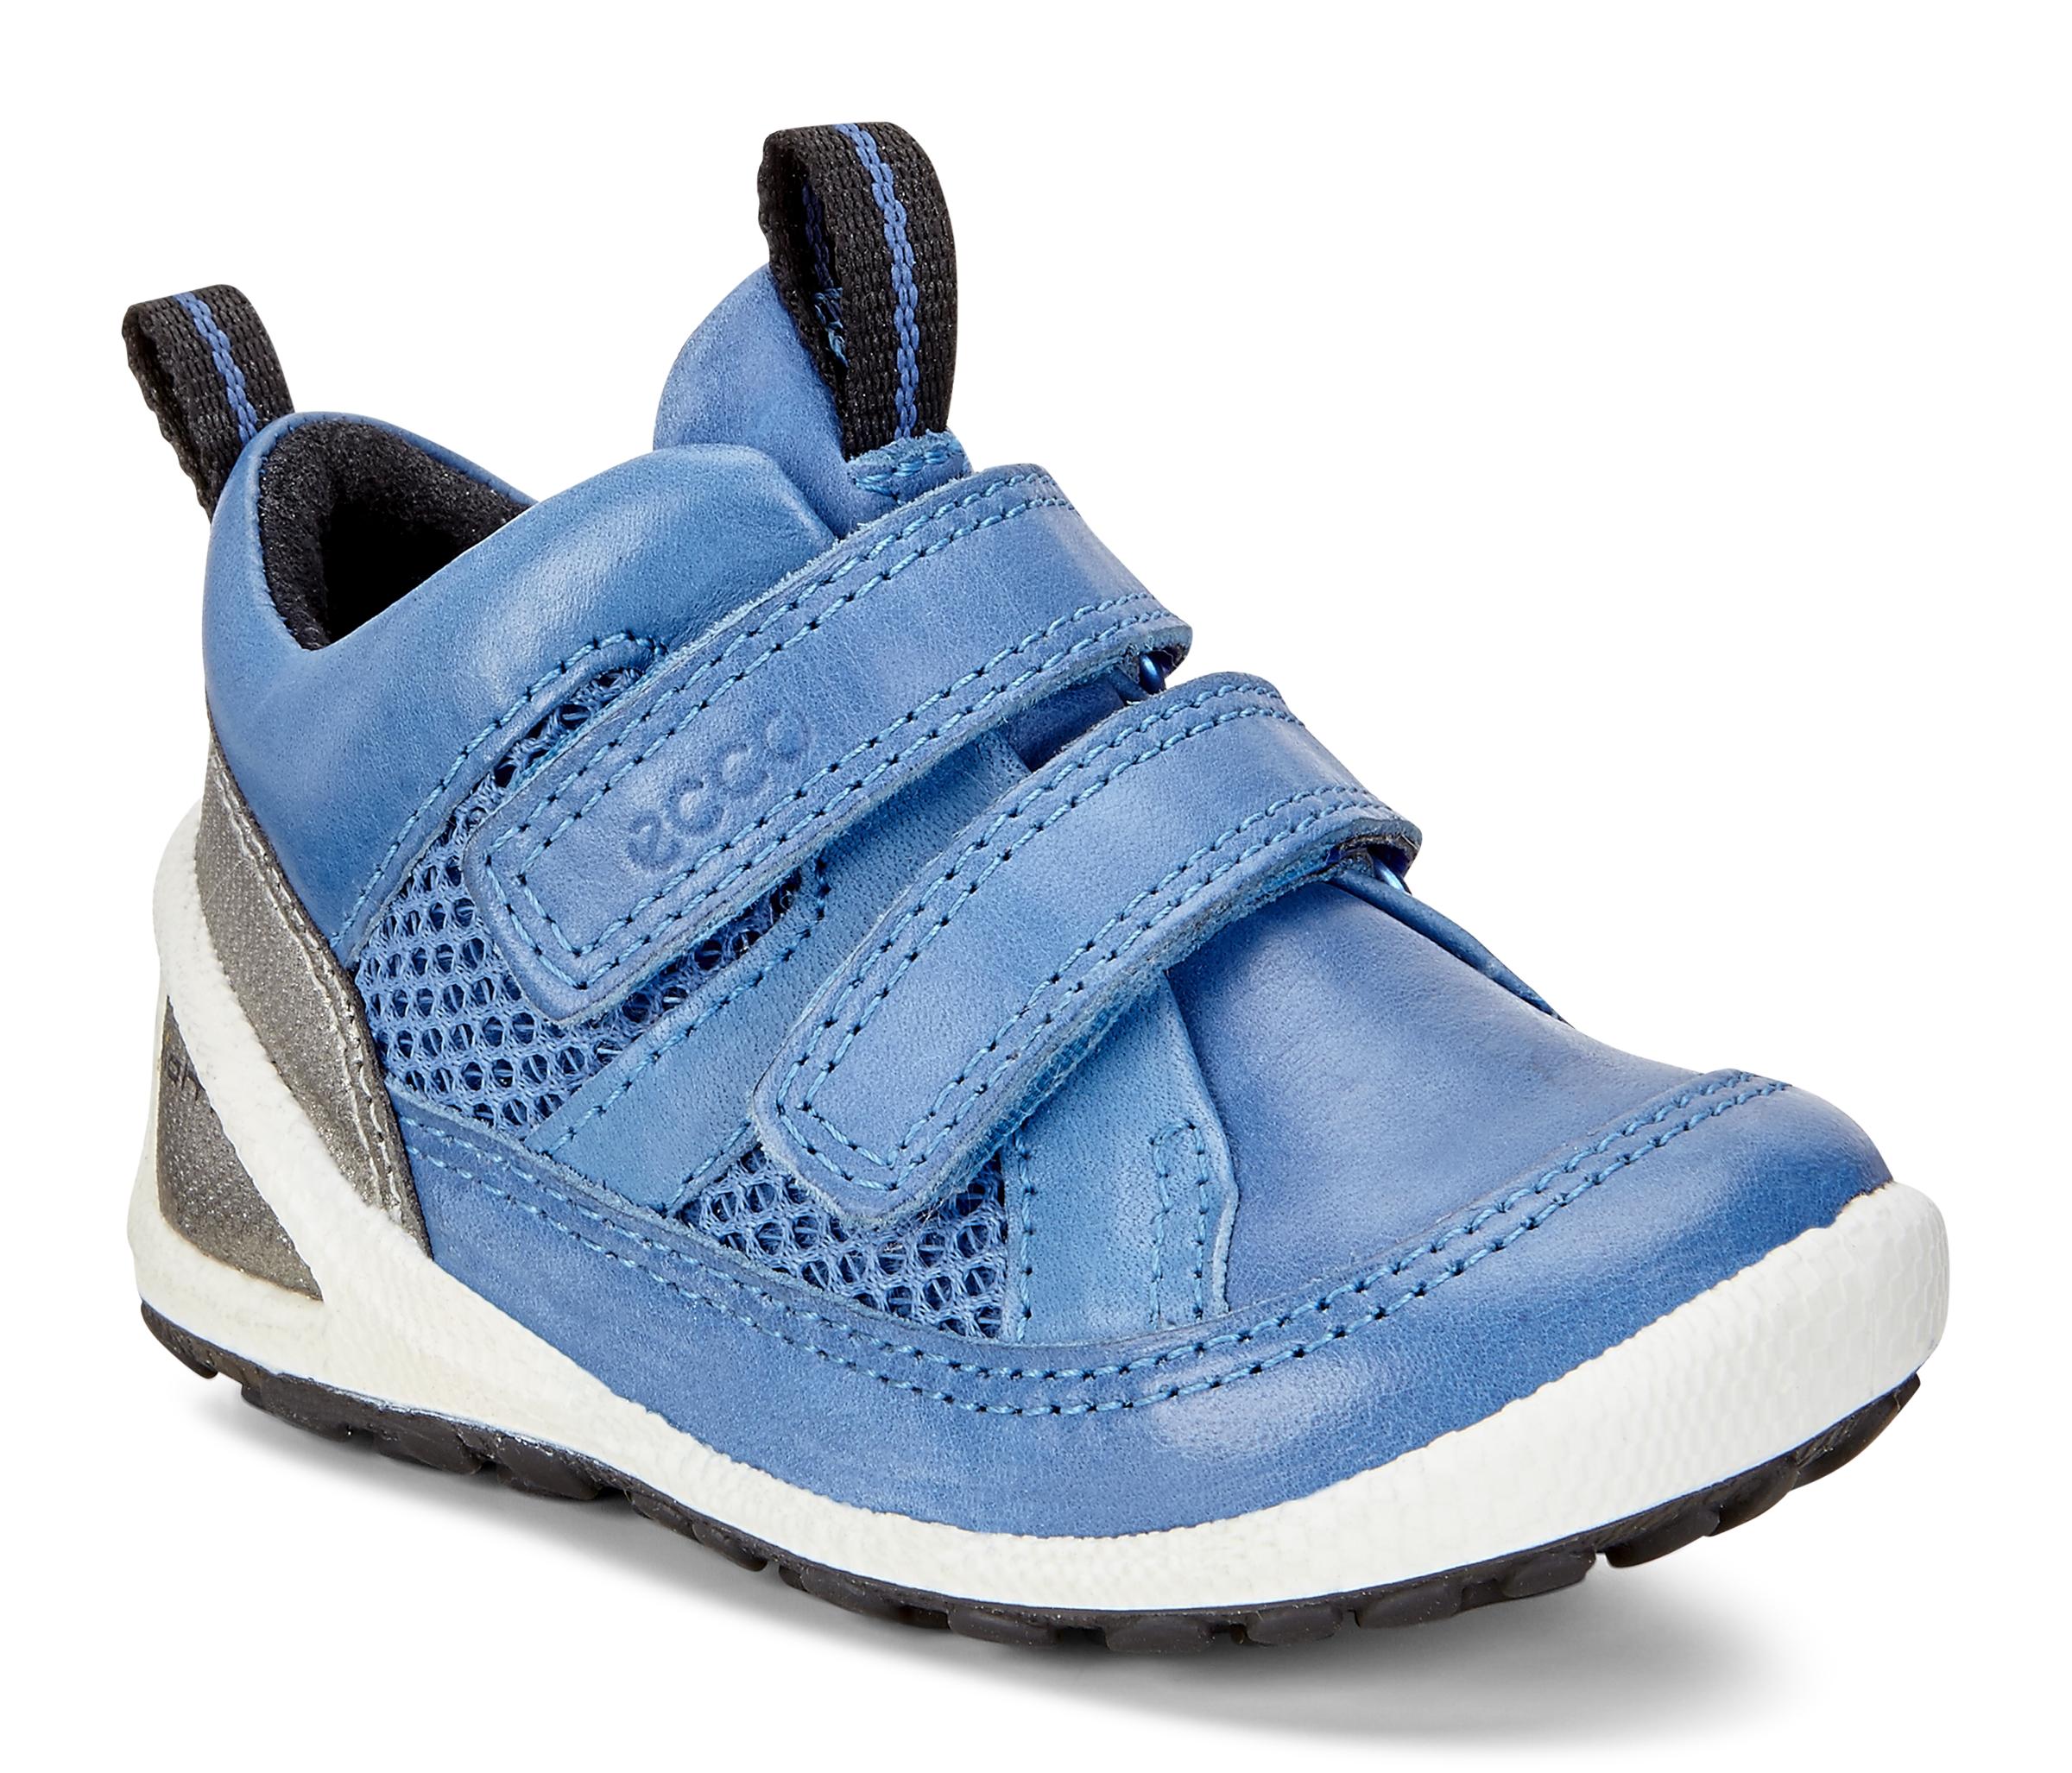 Biom Lite Closed Boys First Sandals